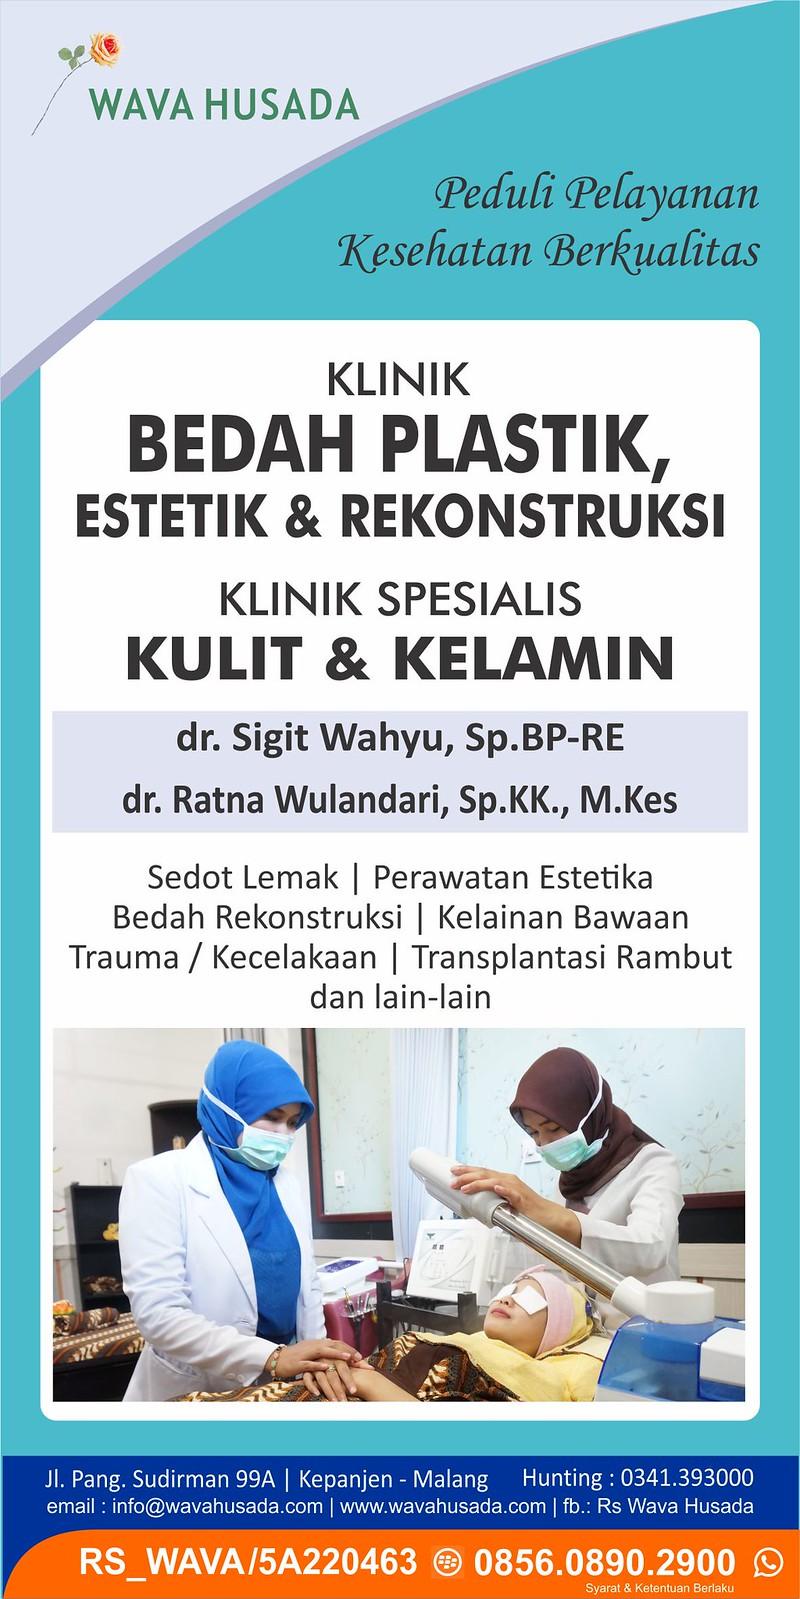 klinik bedah plastik, estetik, dan rekonstruksi wava husada